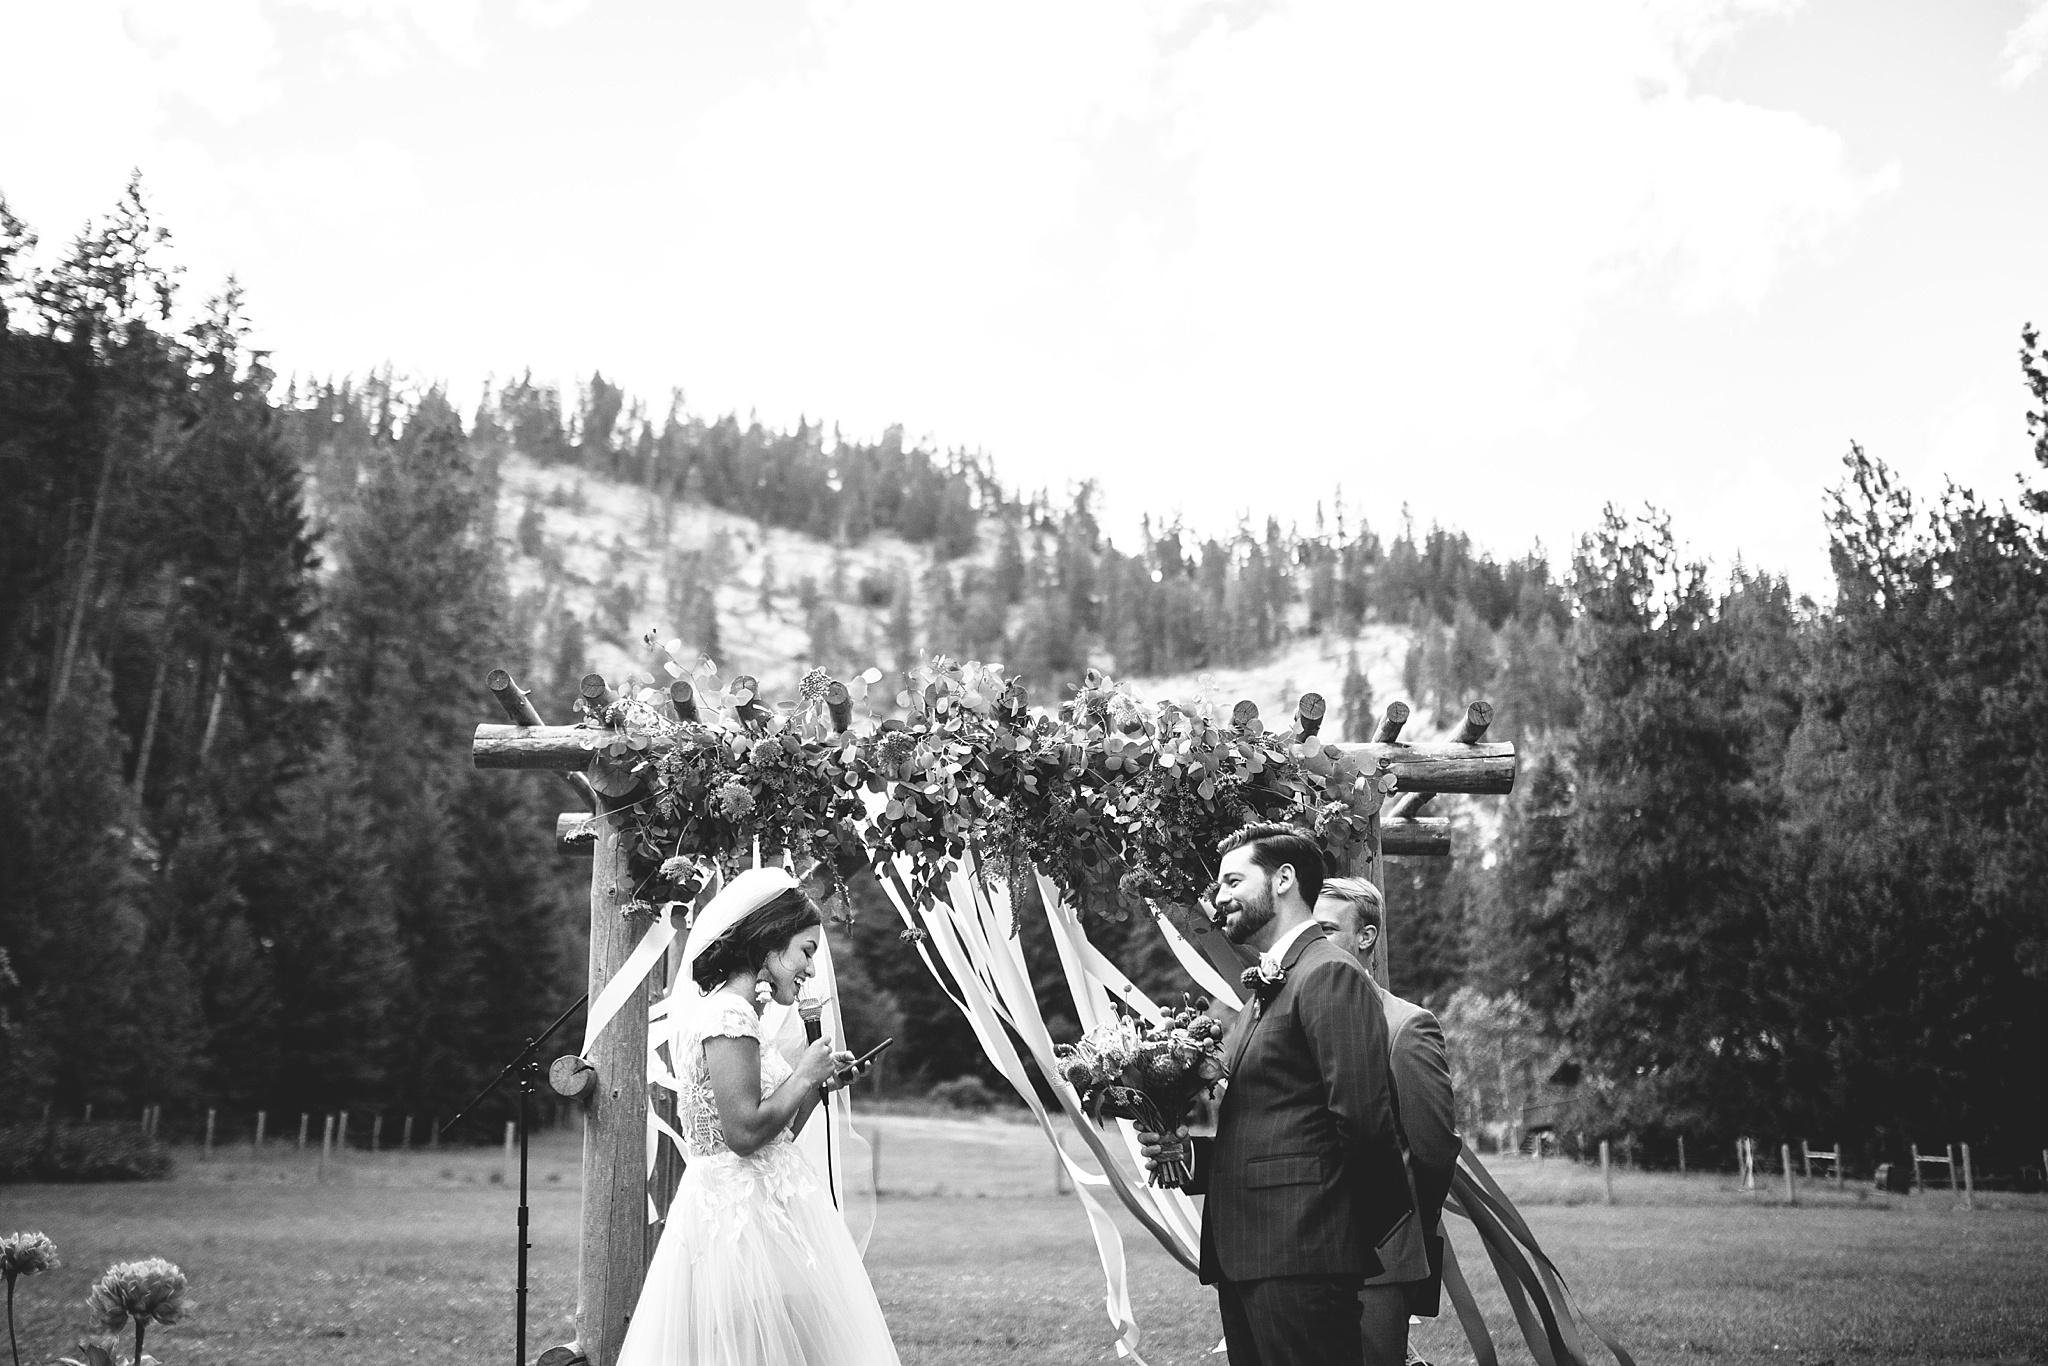 outdoor nature wedding ceremony